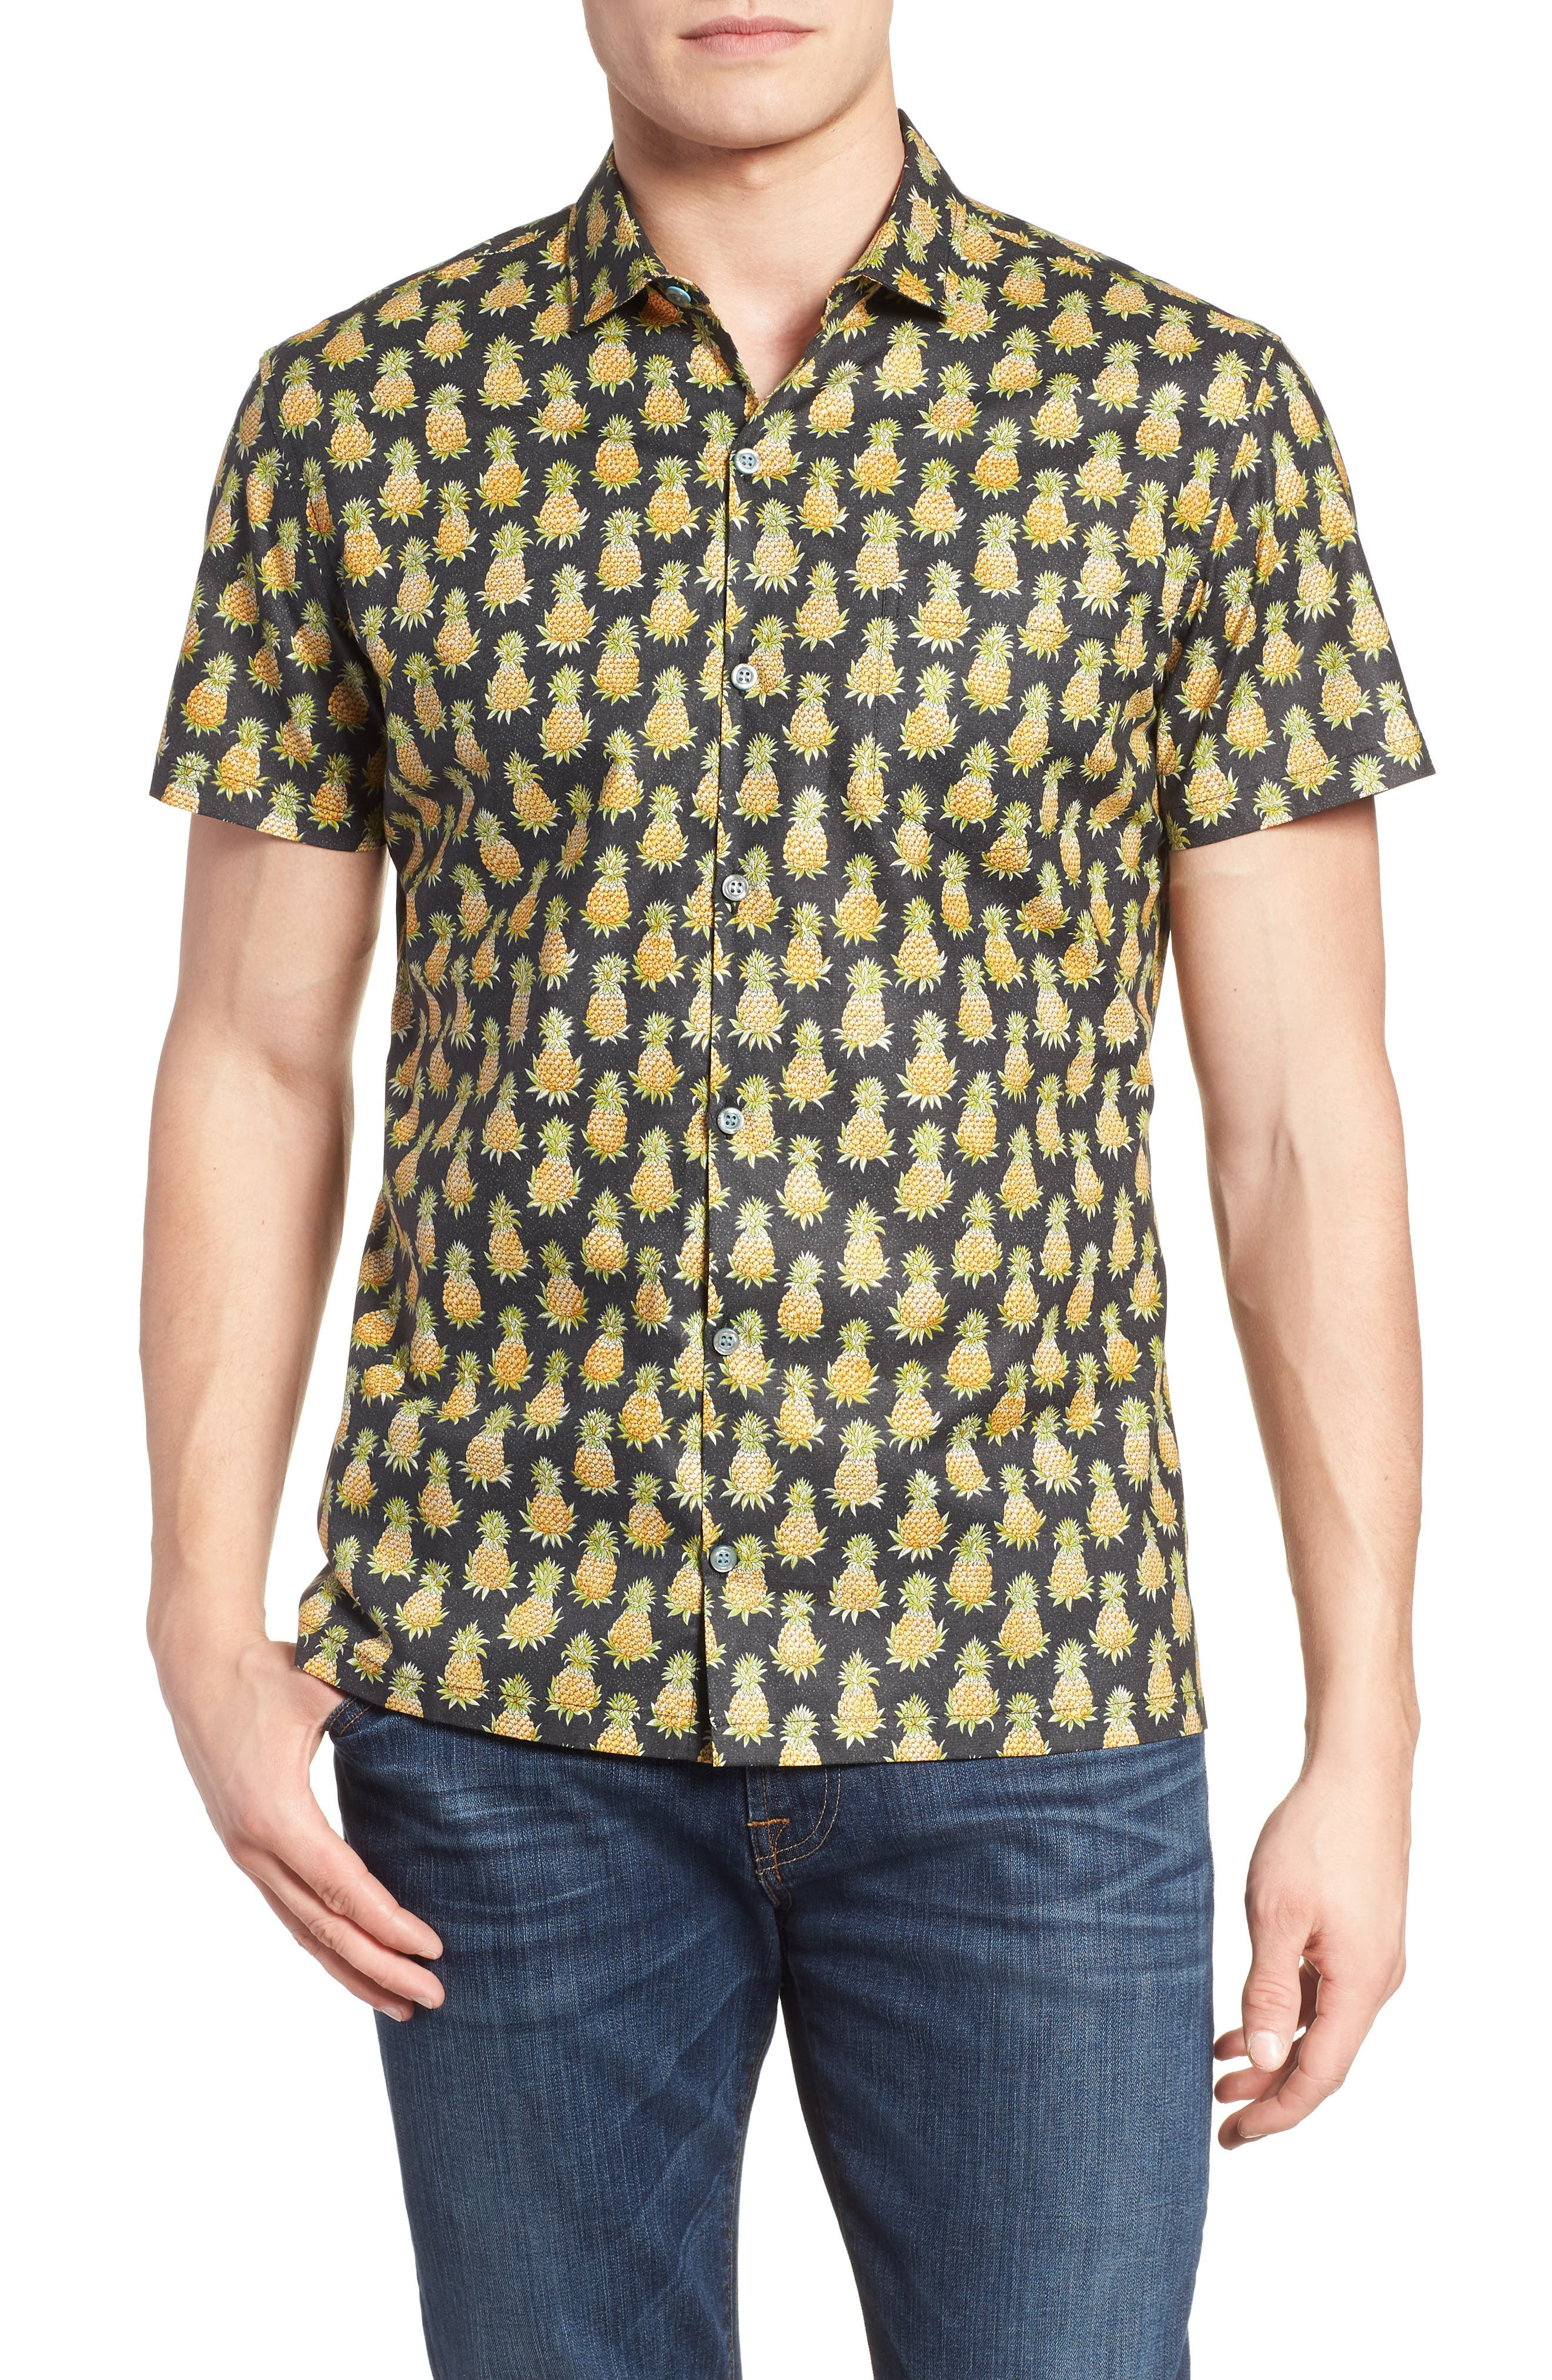 Pineaplism Trim Fit Camp Shirt,                             Main thumbnail 1, color,                             Black